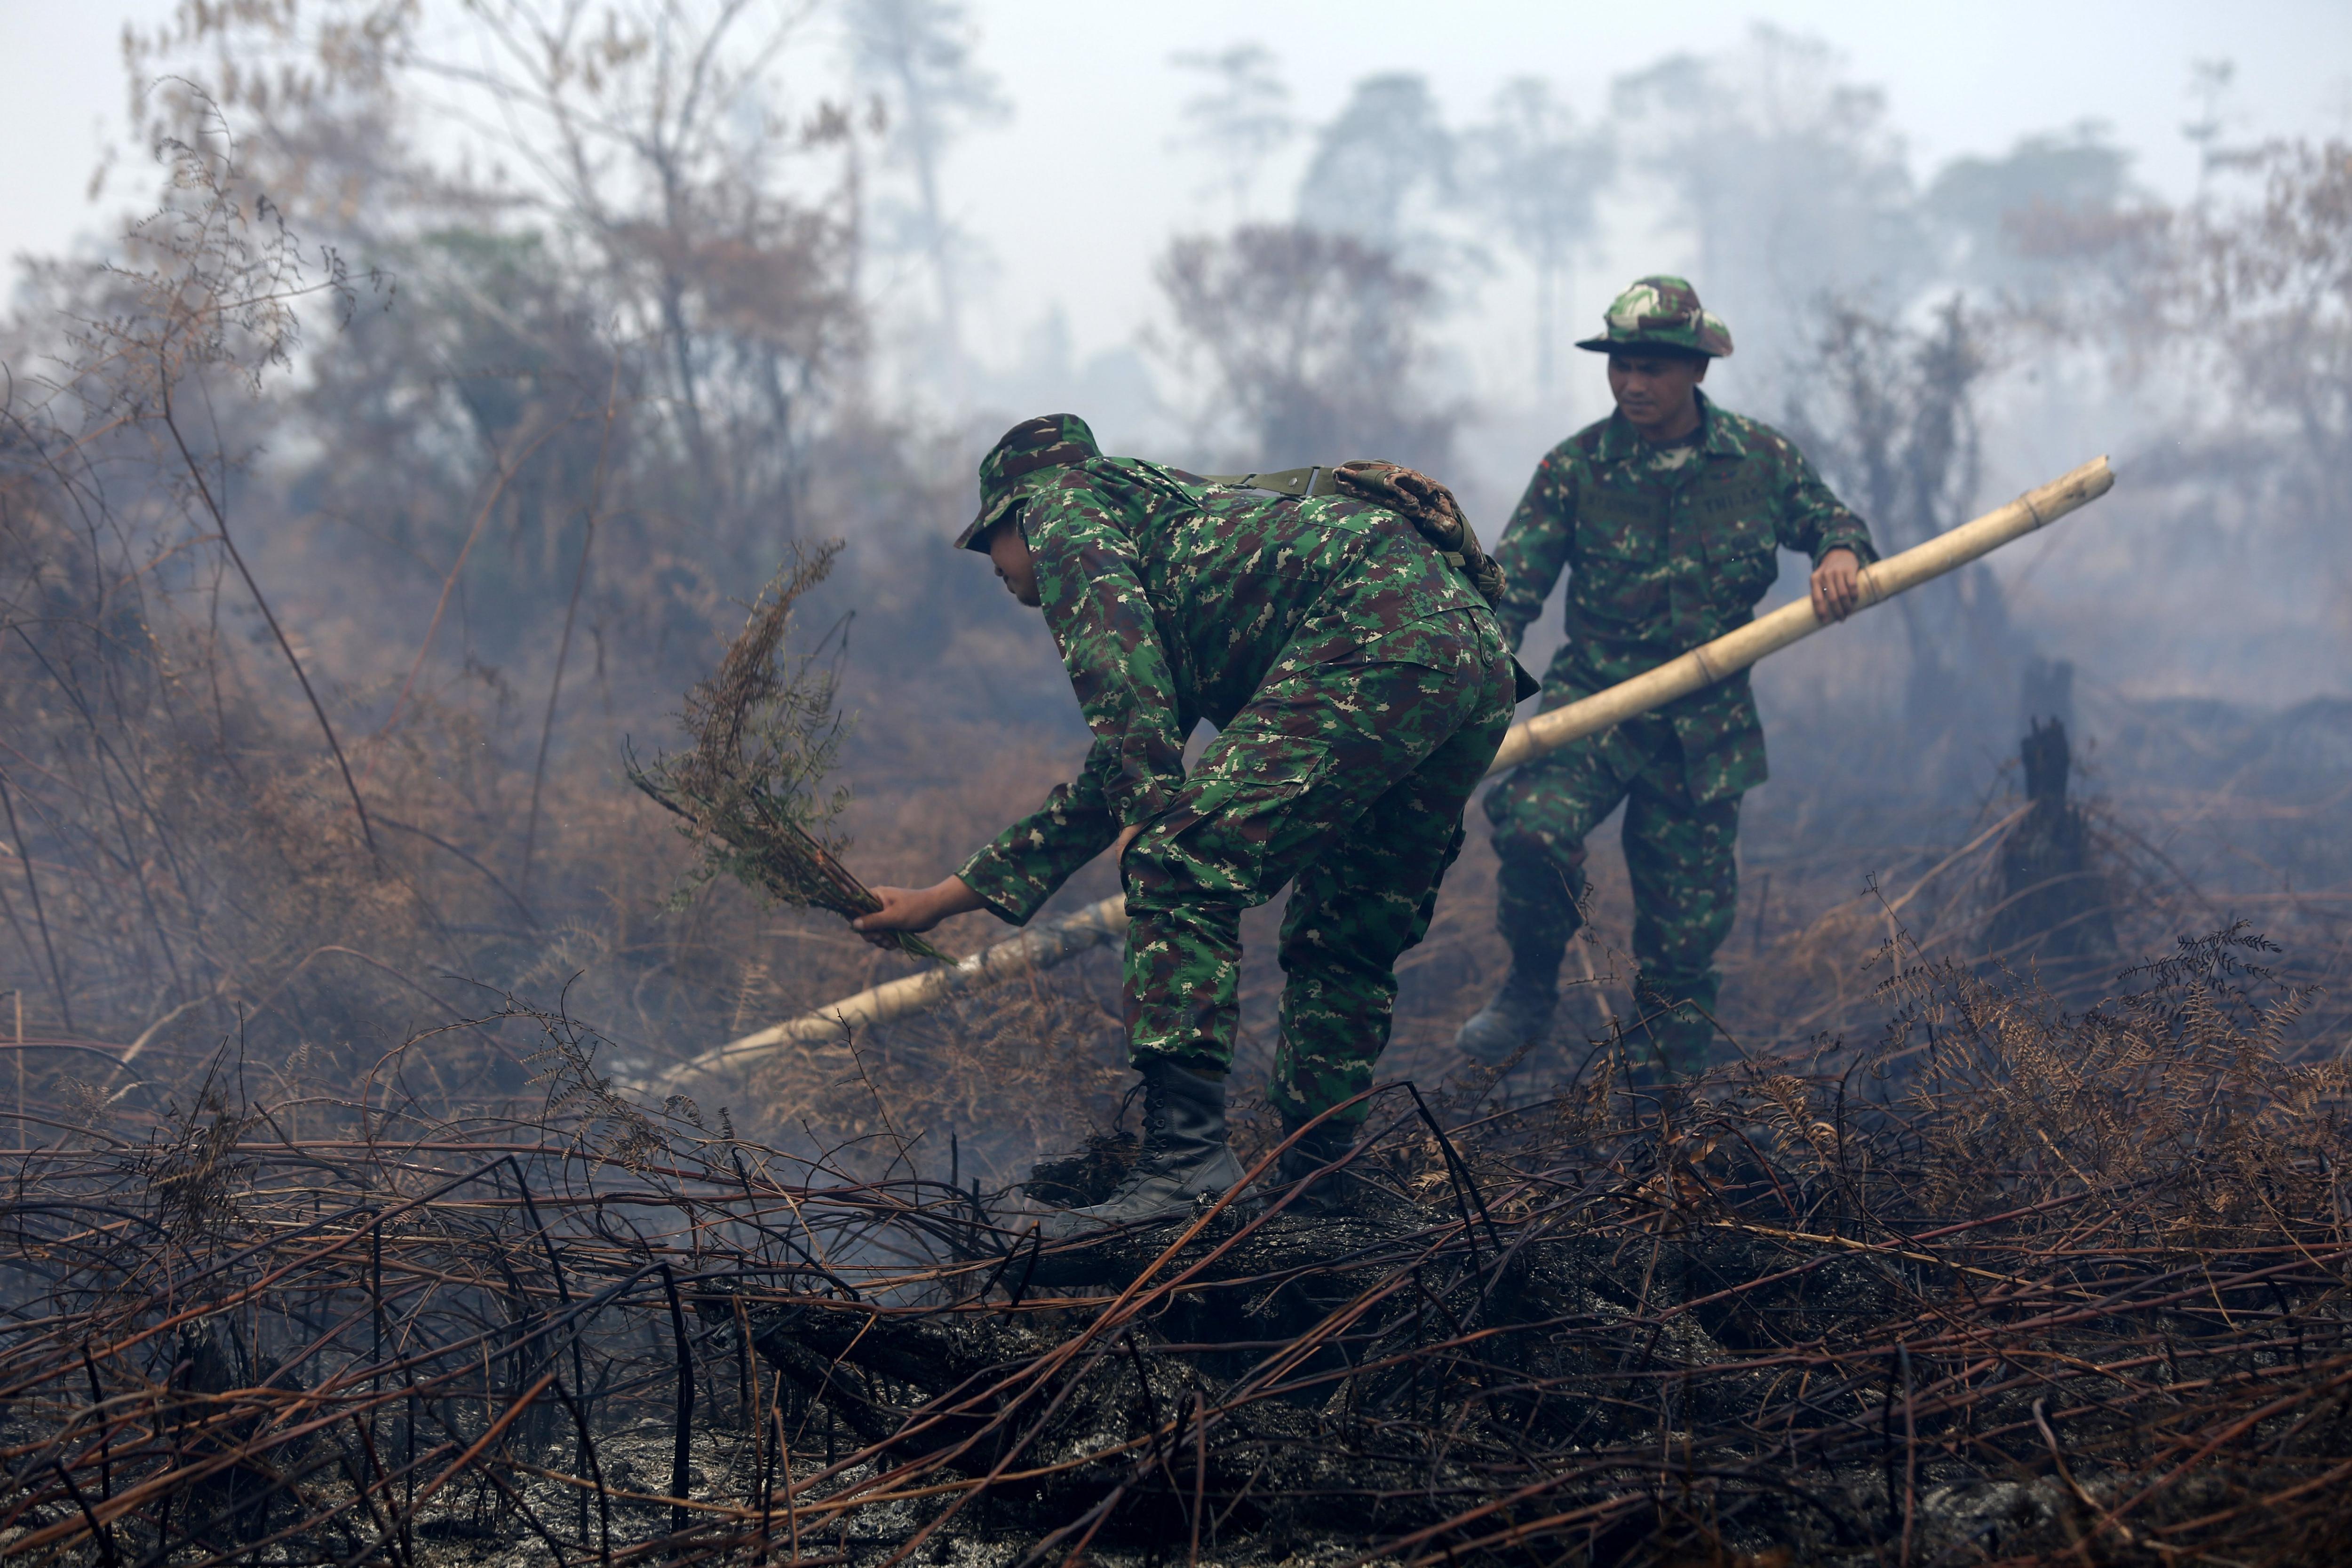 Militars indis tracten d'extingir un incendi a Meuloboh, a Aceh (Indonèsia). /HOTLI SIMANJUNTAK